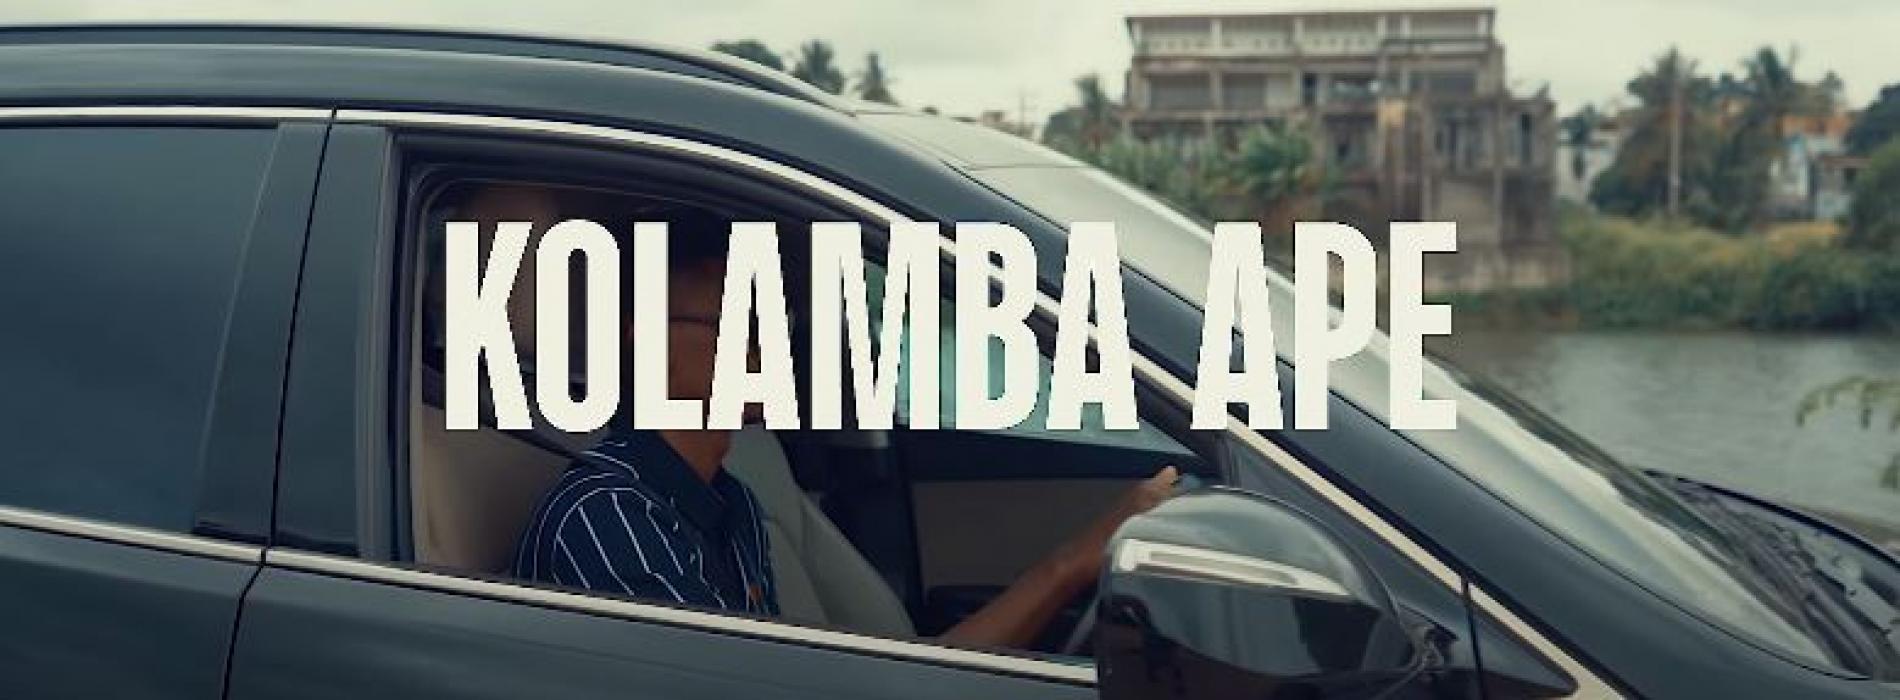 New Music : Ambroz – Kolamba Ape (Official Video) ft Paranoid Note